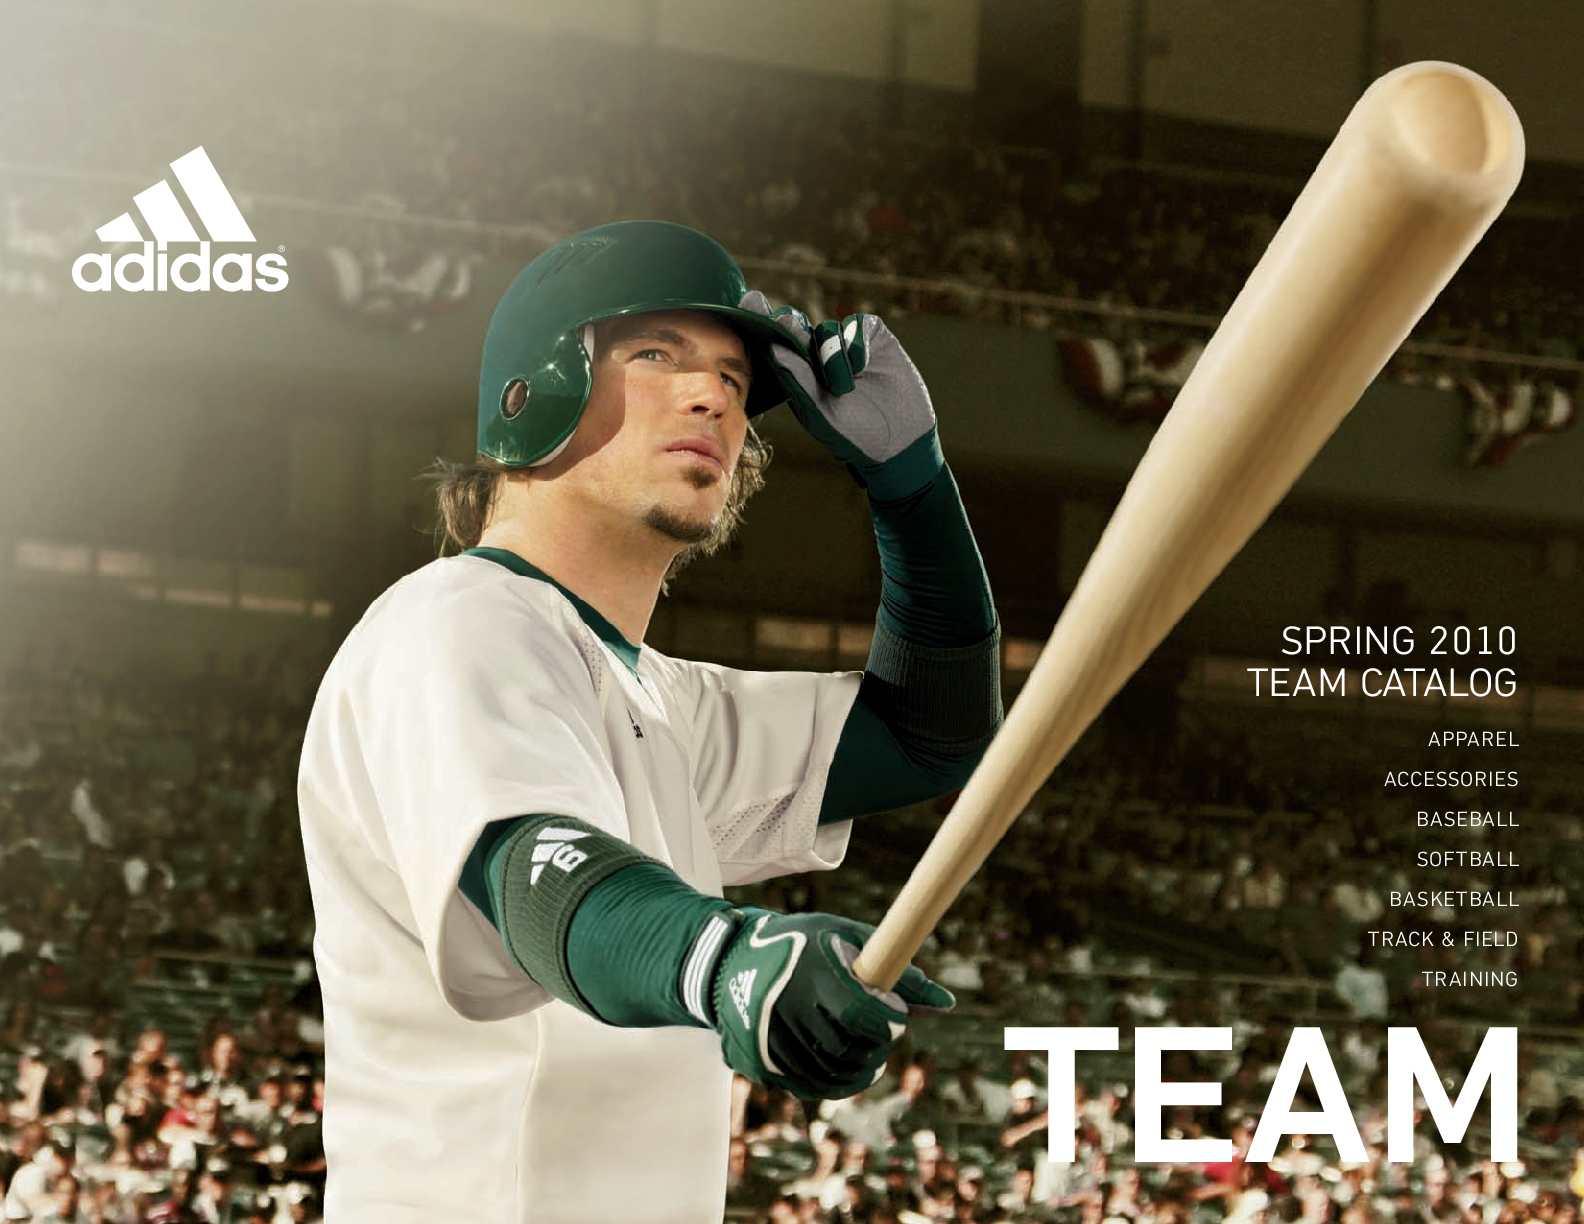 cf26f2d30a6 Calaméo - Adidas 2010 Spring Team Catalog